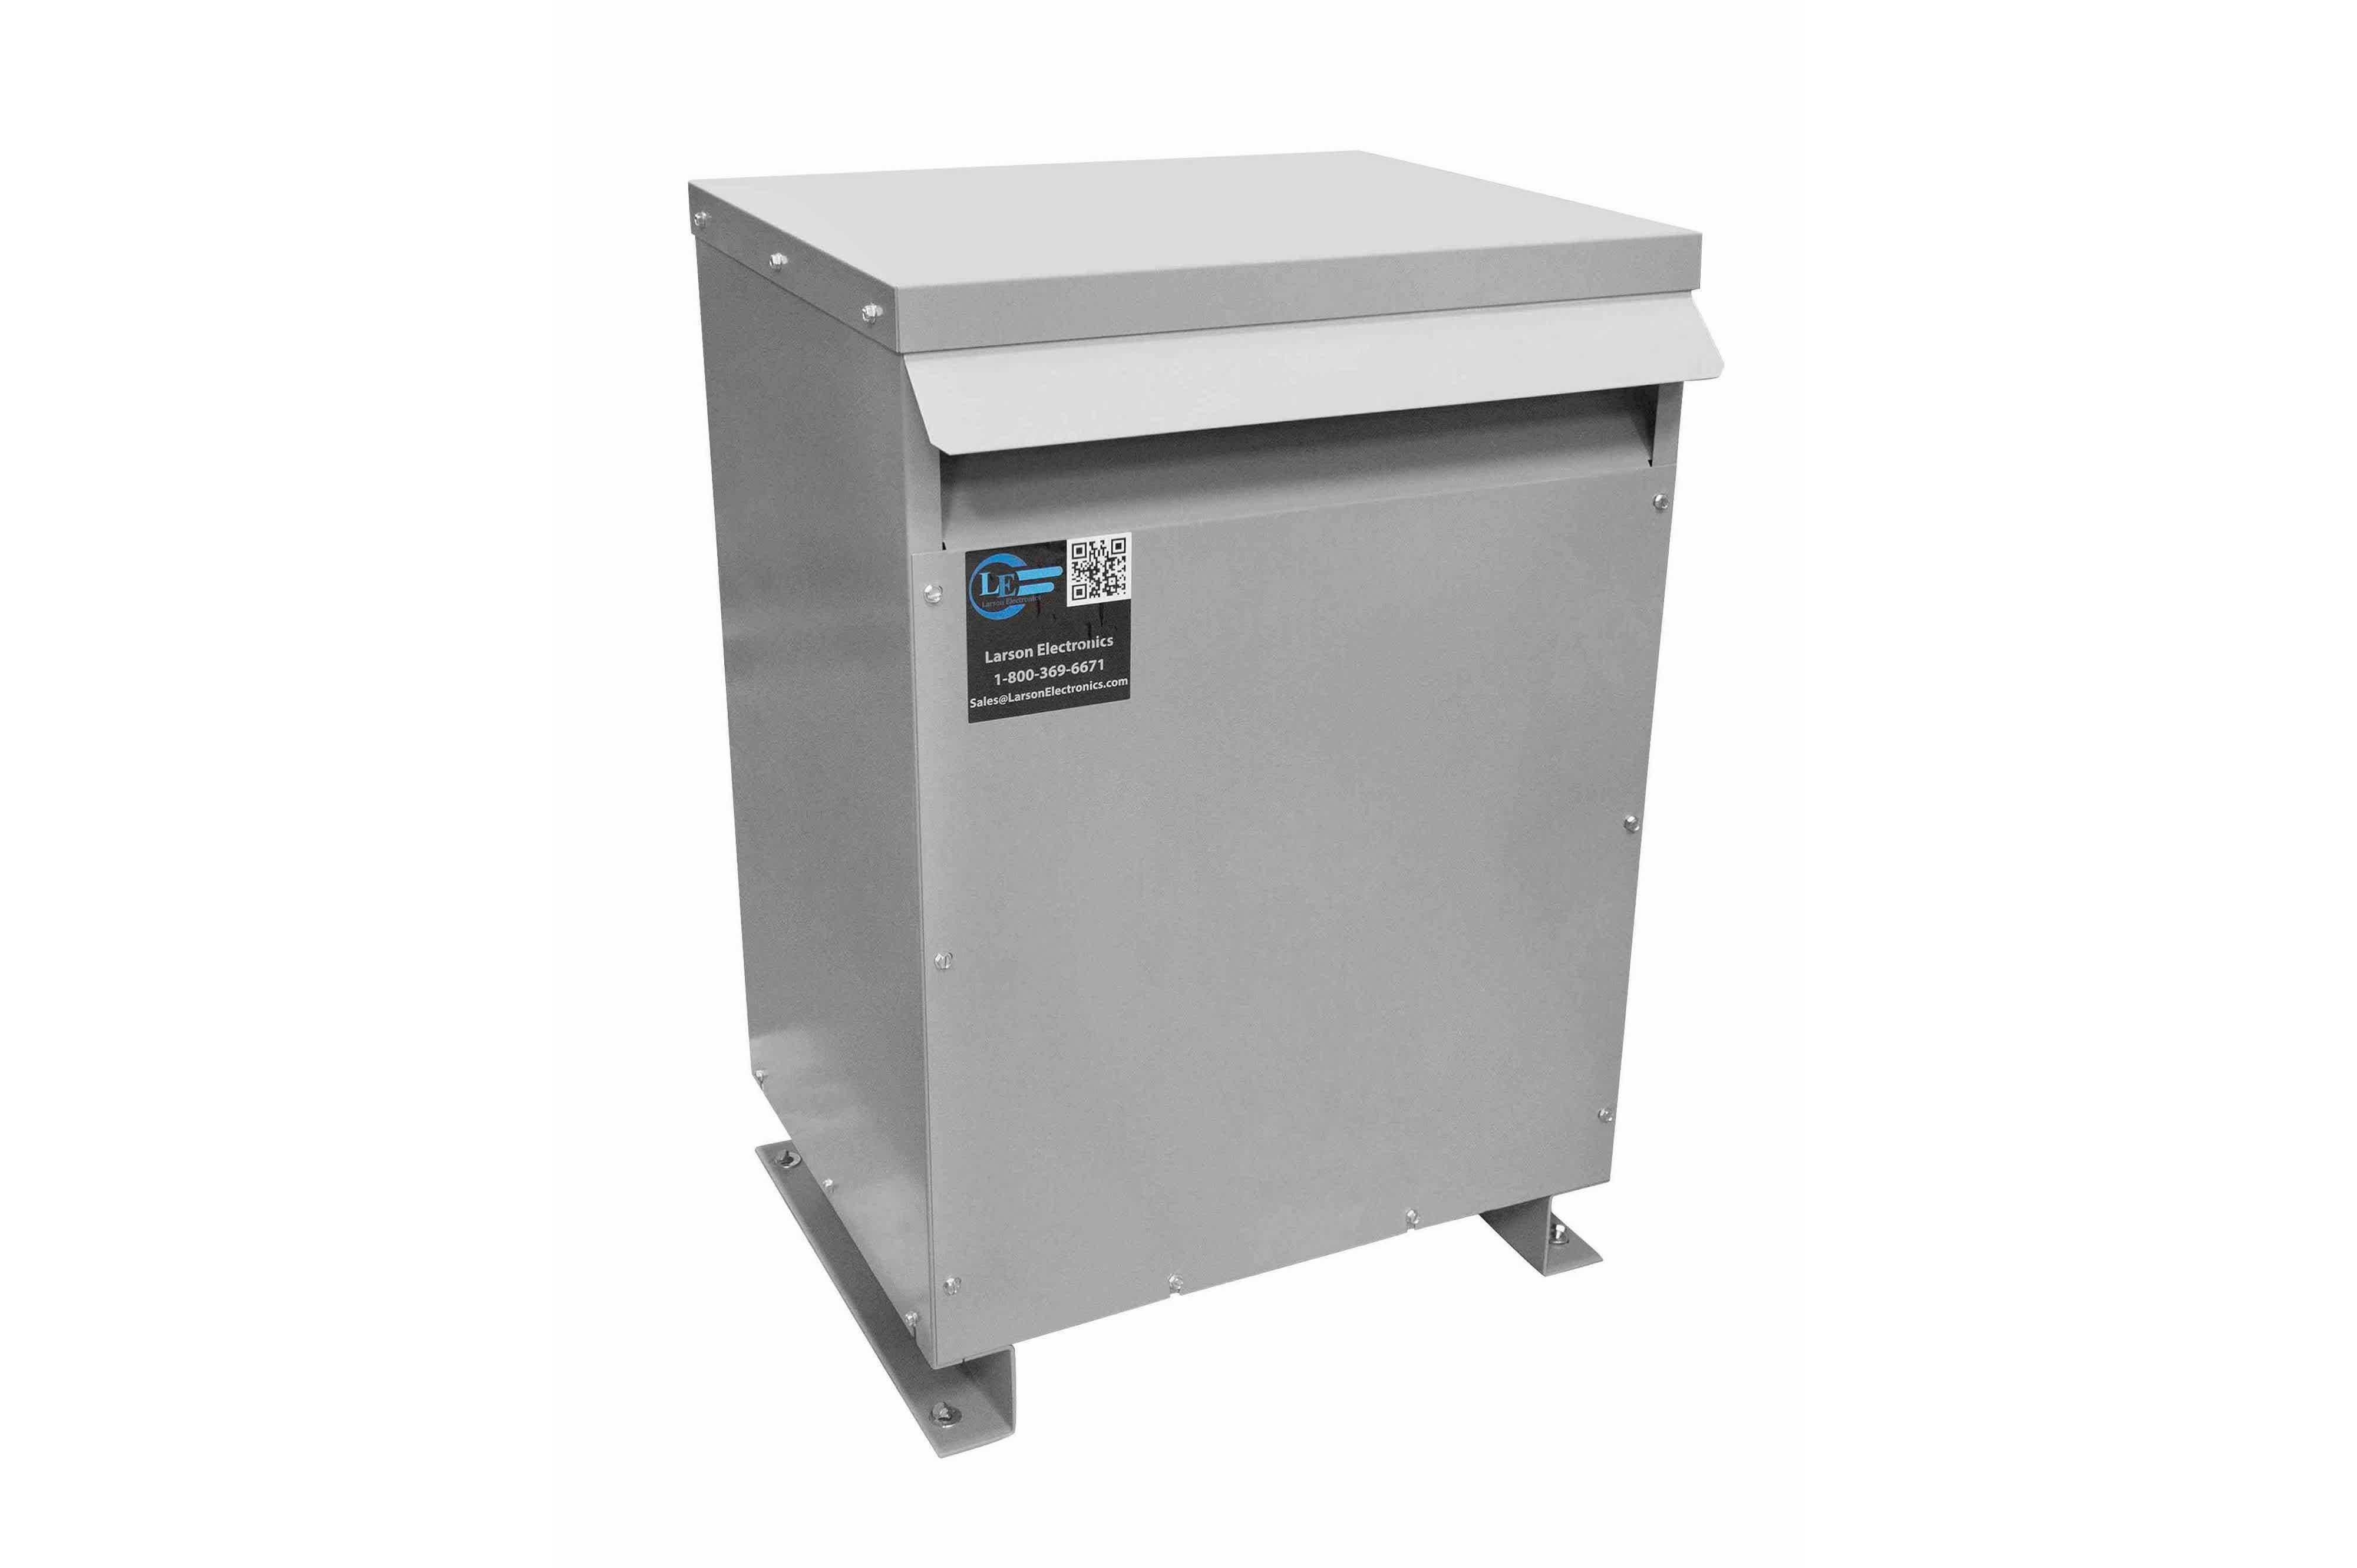 18 kVA 3PH Isolation Transformer, 380V Wye Primary, 480Y/277 Wye-N Secondary, N3R, Ventilated, 60 Hz